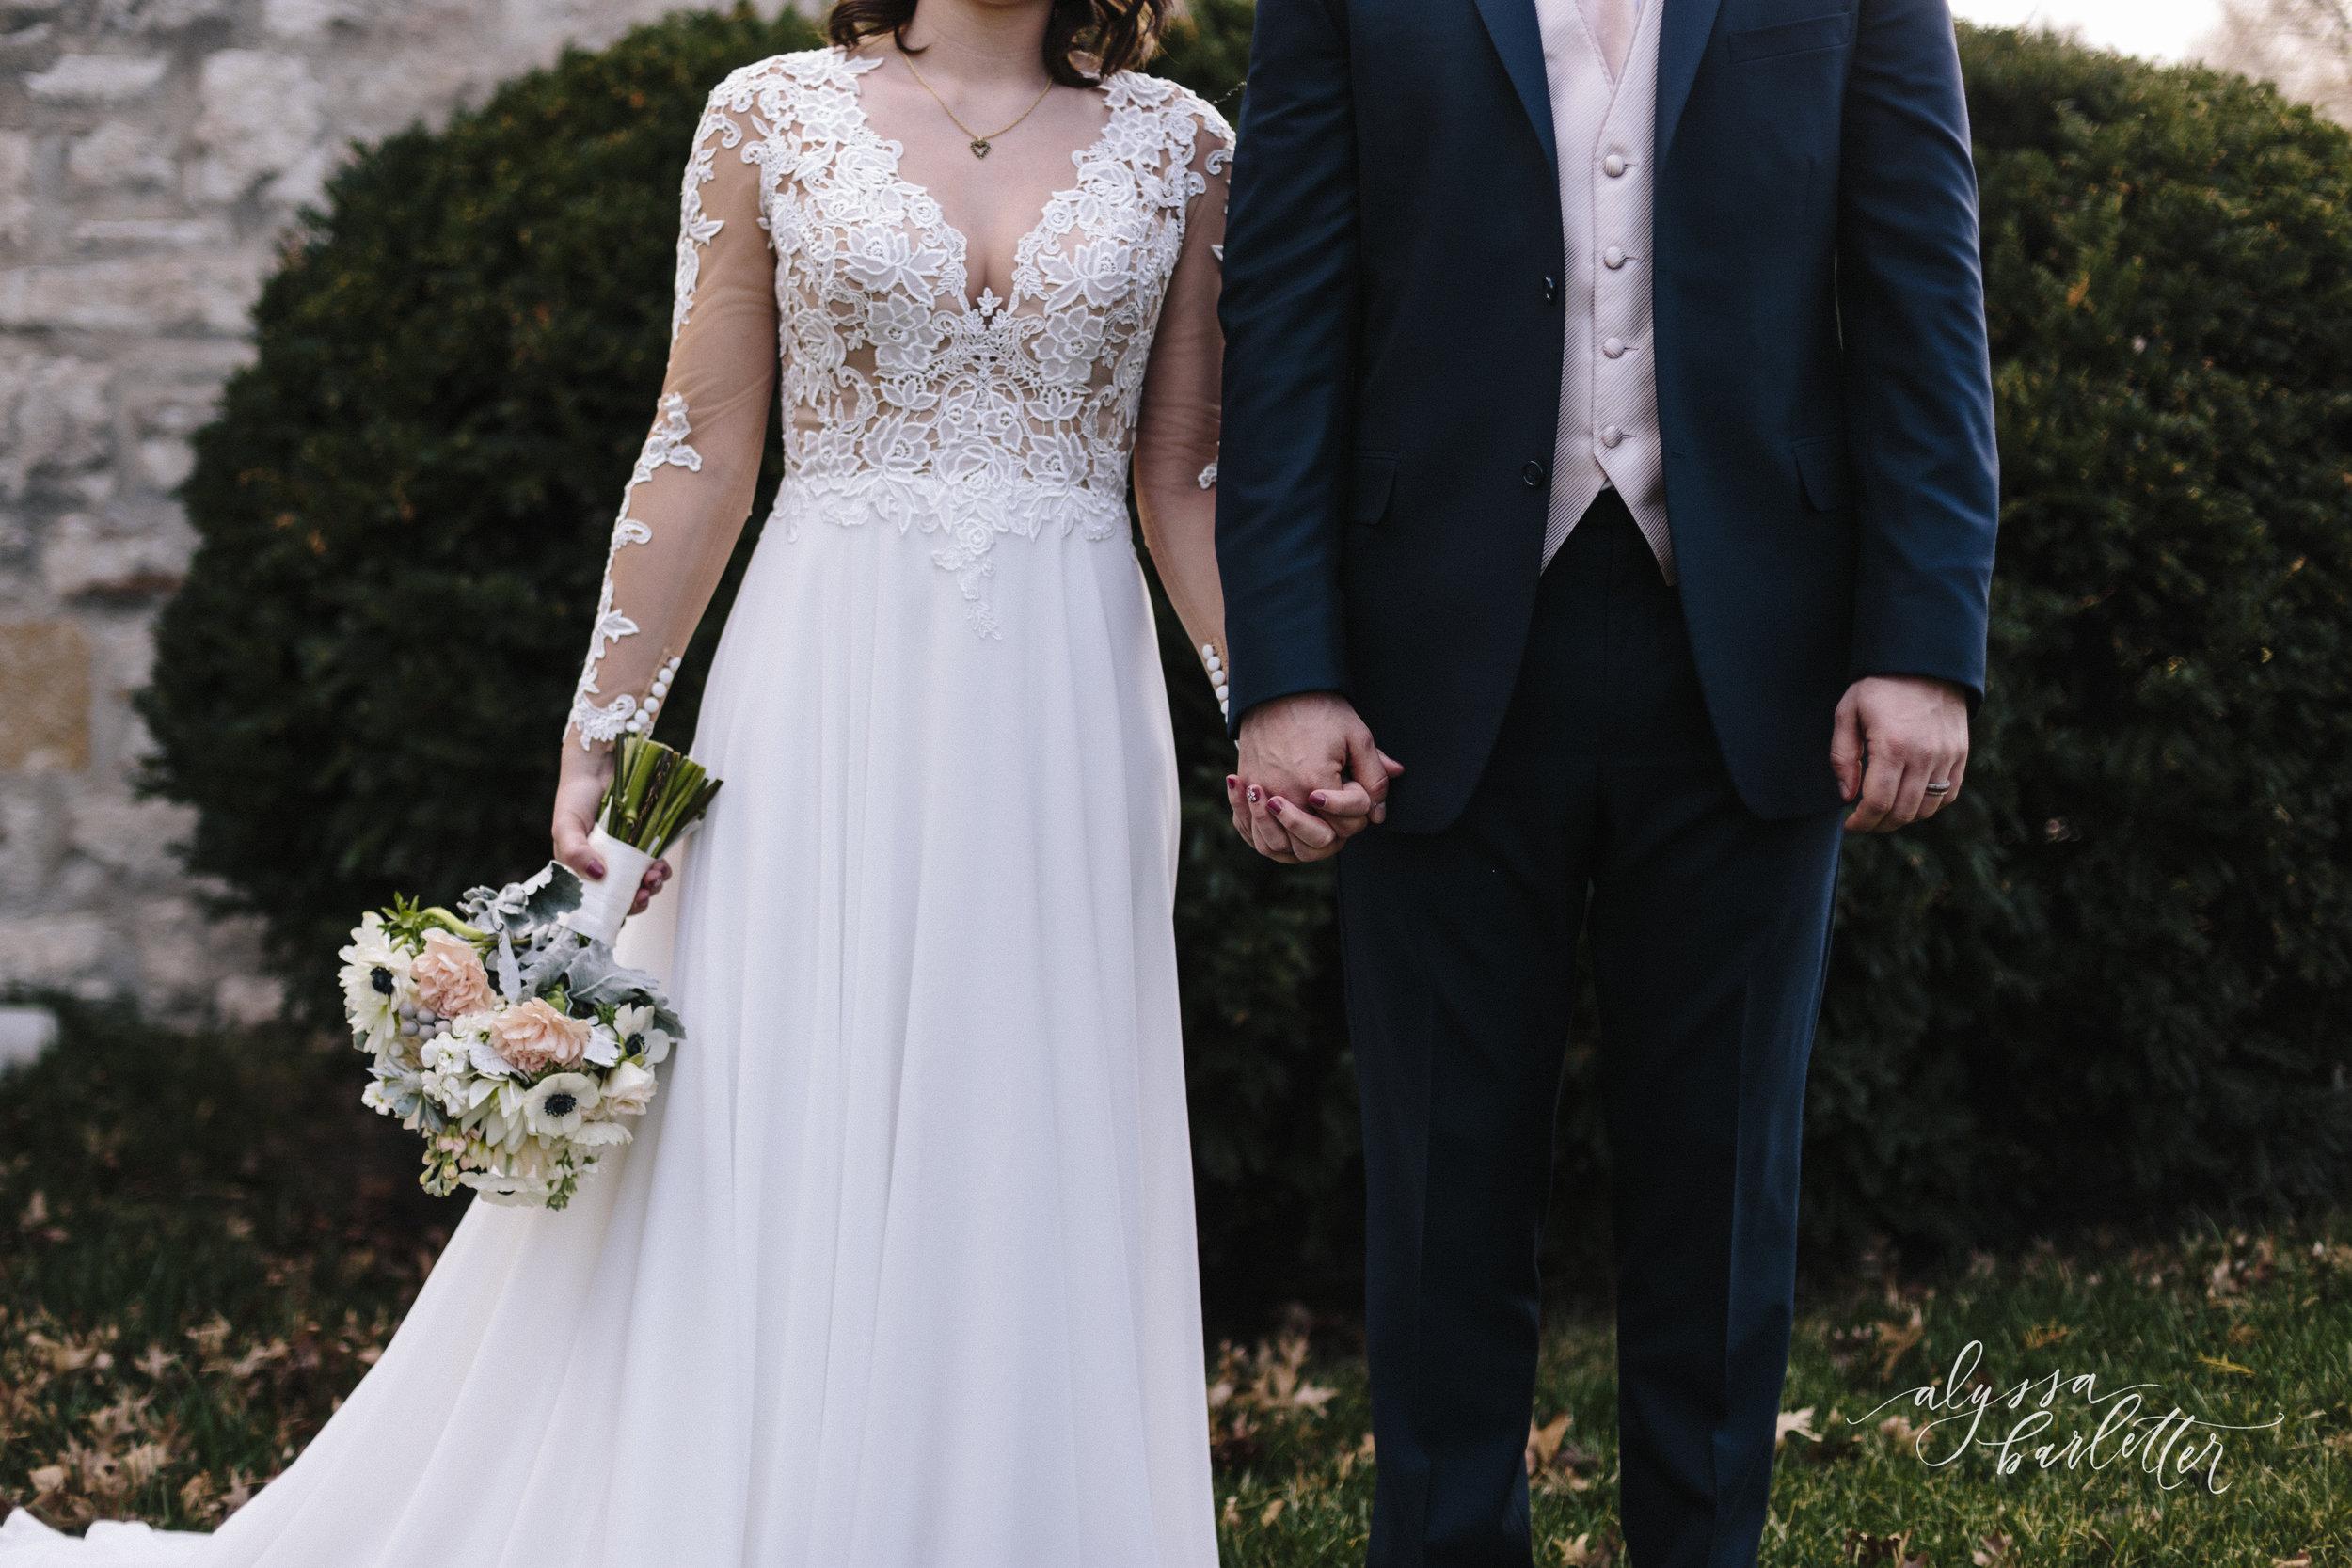 alyssa barletter wedding photography-900-5.jpg